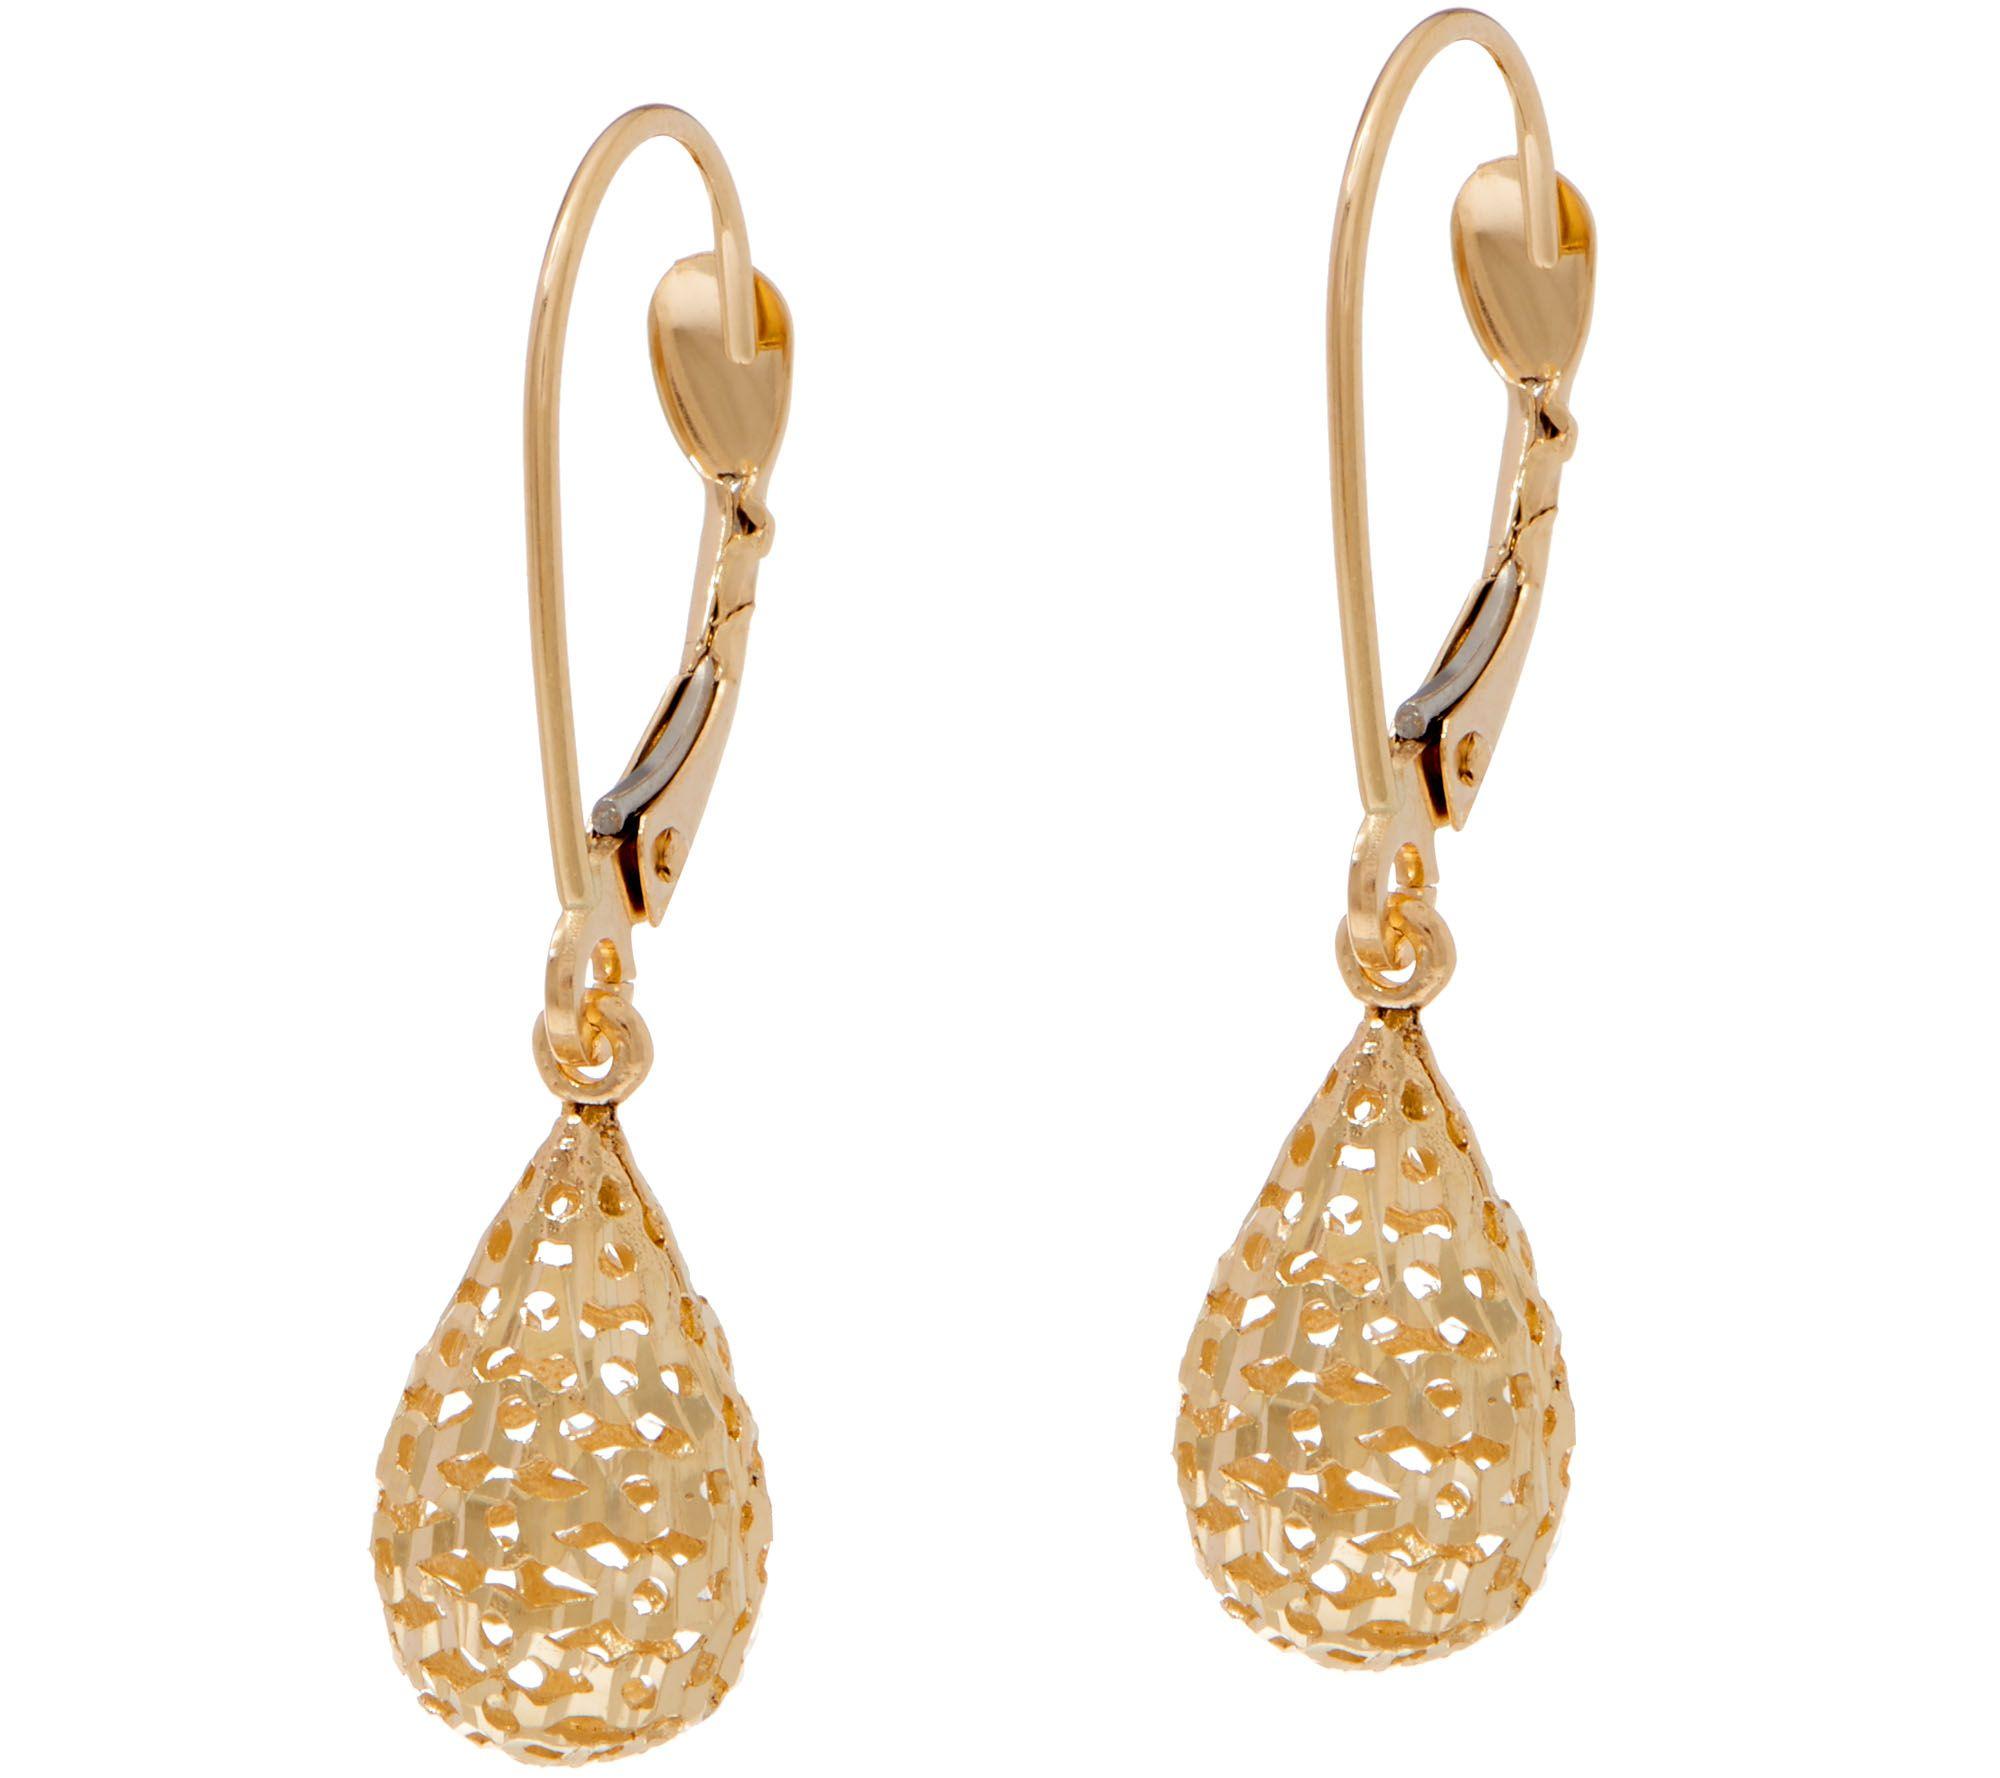 14k Gold Textured Teardrop Dangle Earrings Qvc Com